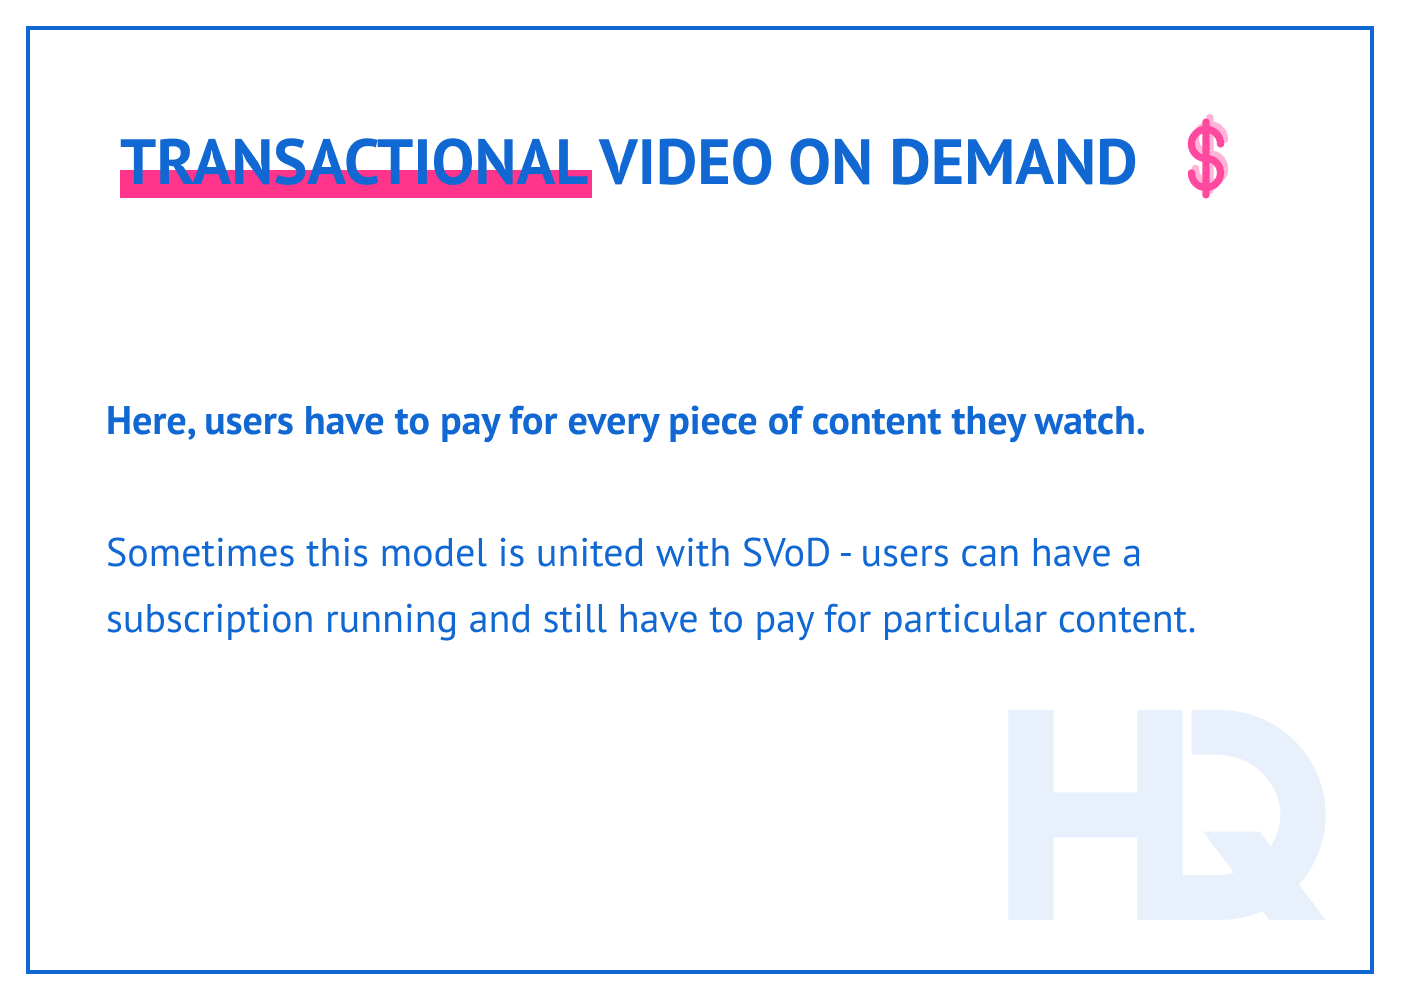 TVoD description.